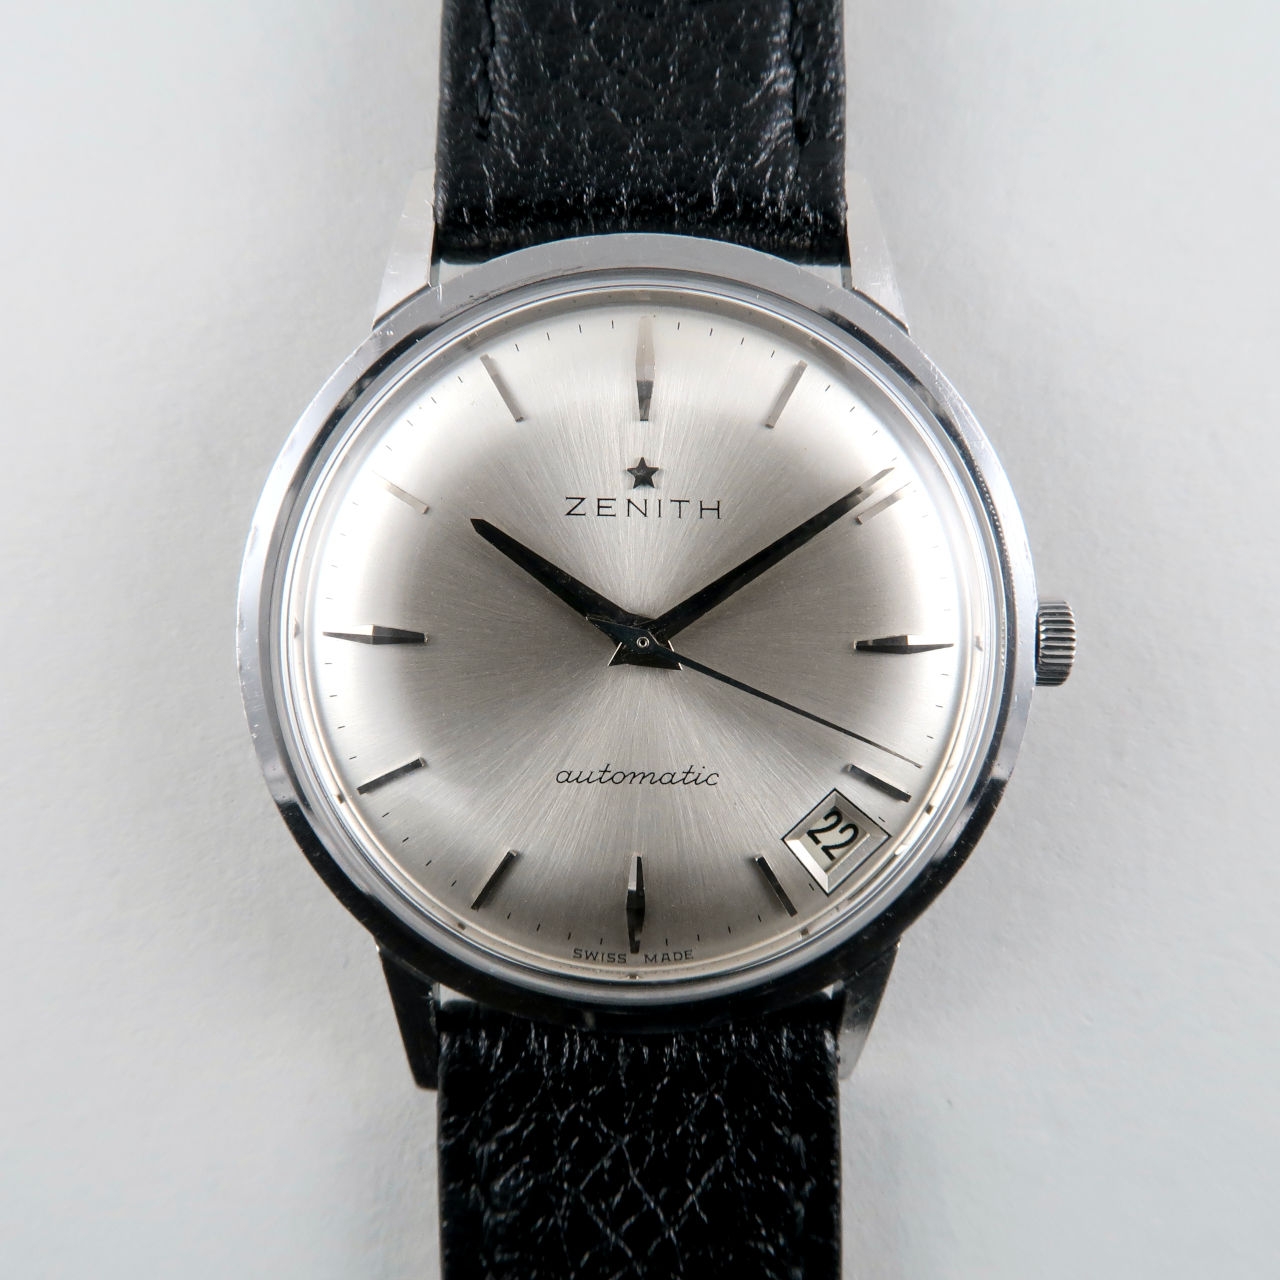 Zenith Cal. 2532 circa 1965   steel automatic vintage wristwatch